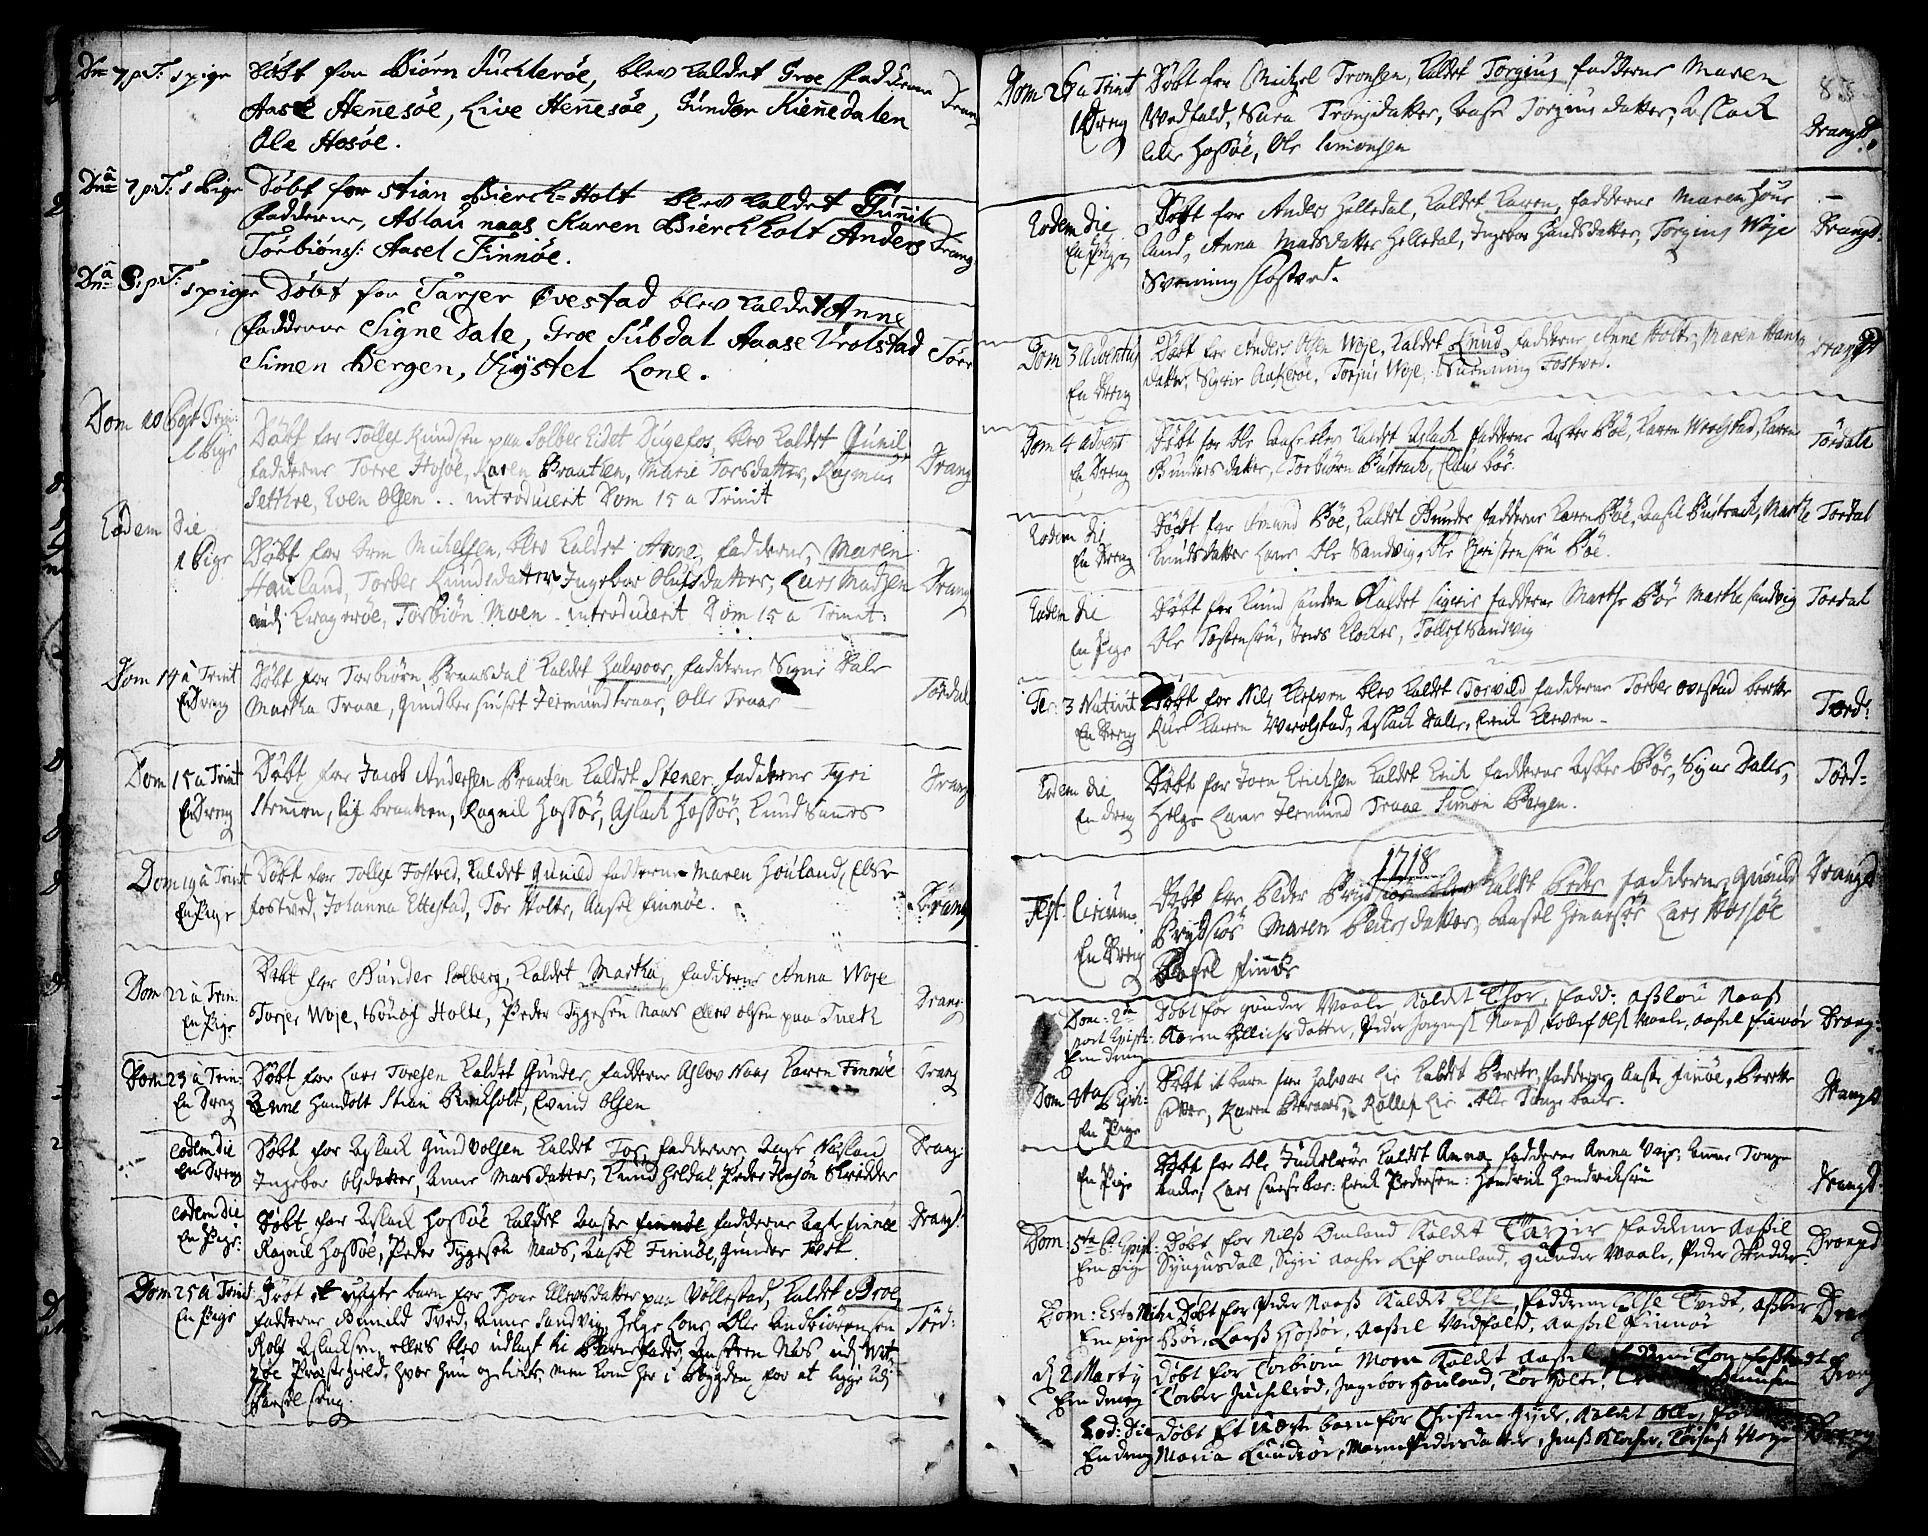 SAKO, Drangedal kirkebøker, F/Fa/L0001: Ministerialbok nr. 1, 1697-1767, s. 83